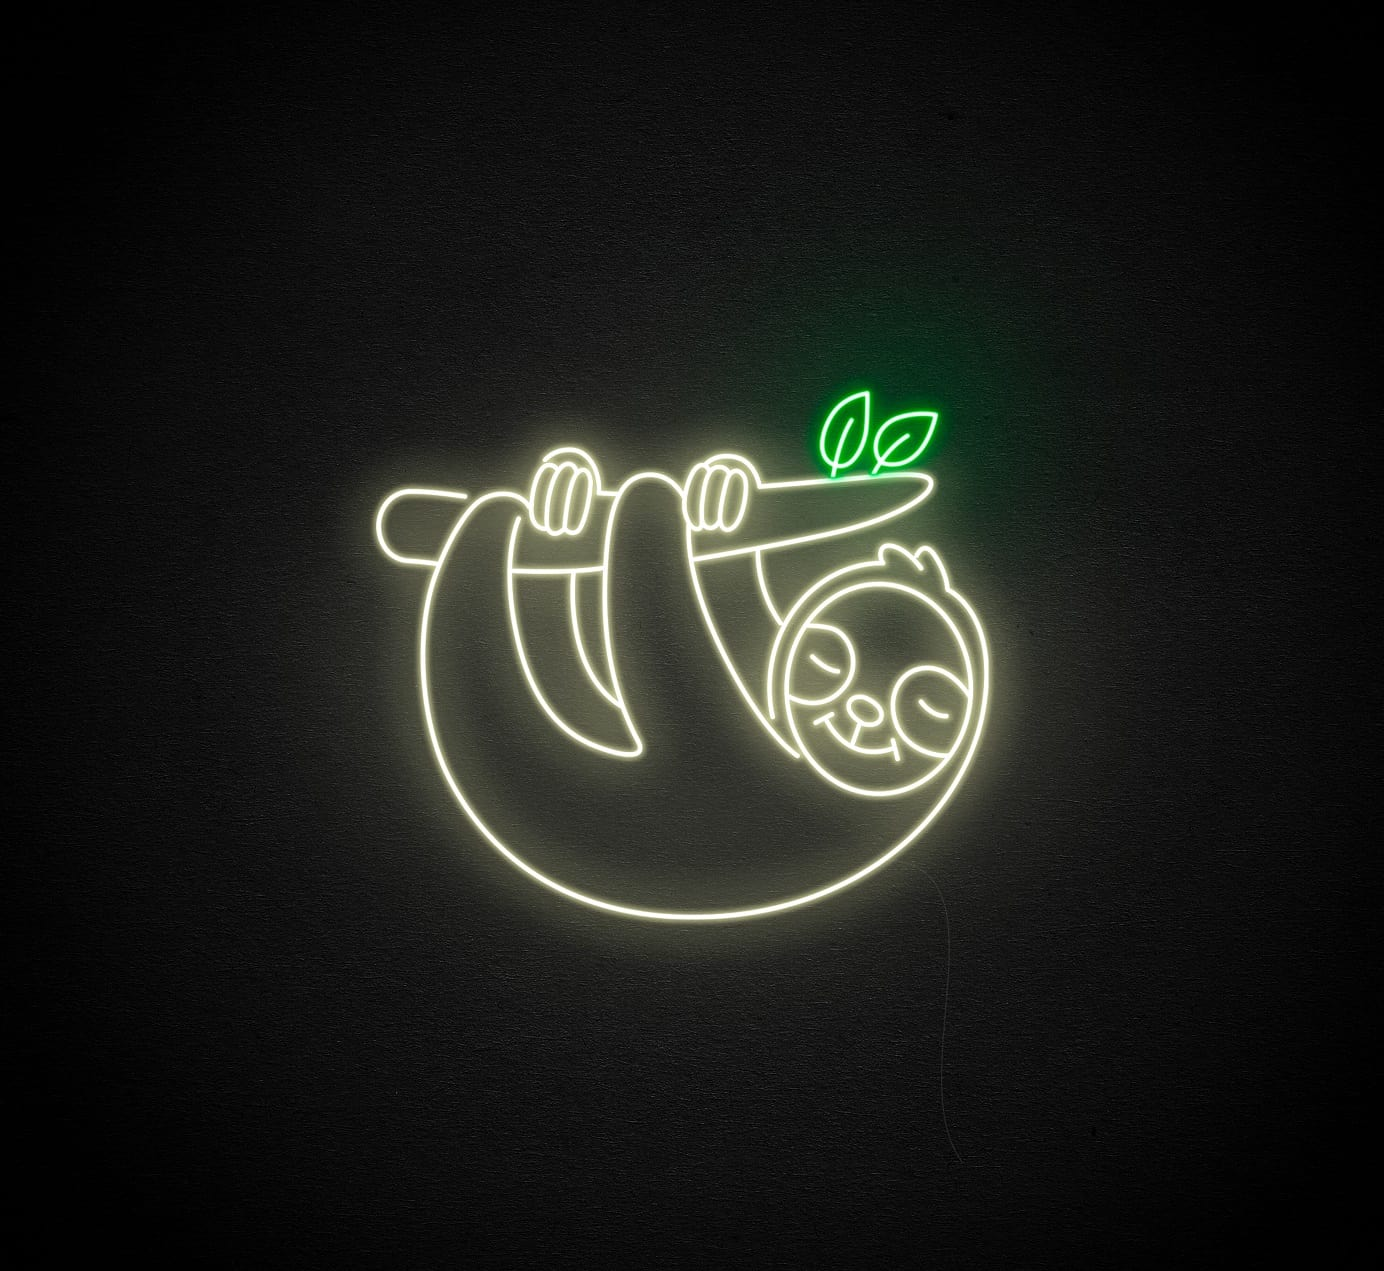 sloth neon light